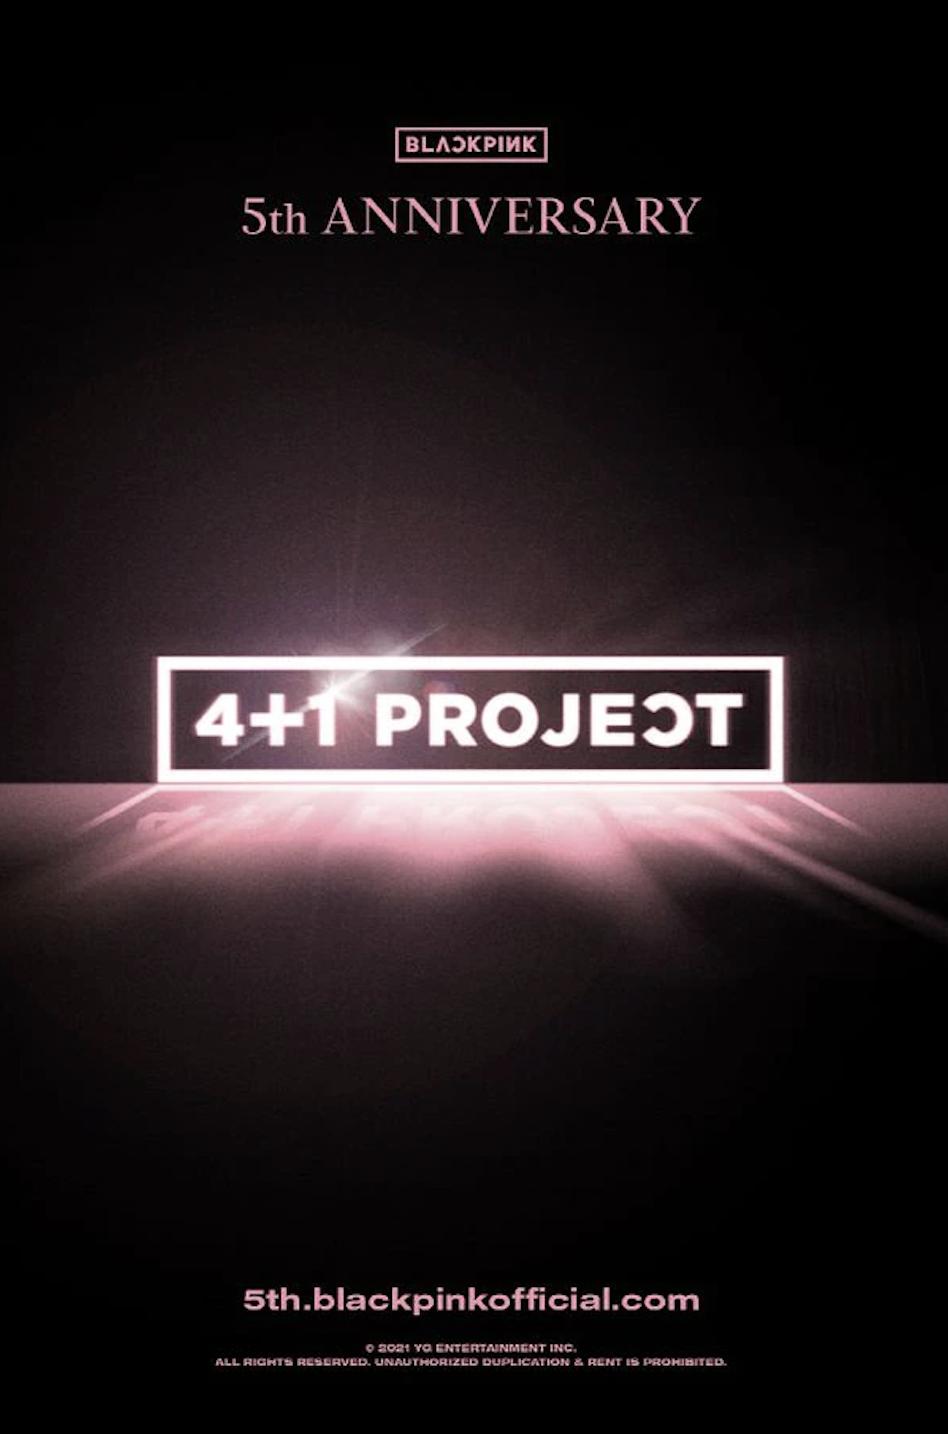 BLACKPINK出道五周年,YG只准备了一部纪录片,被指不走心